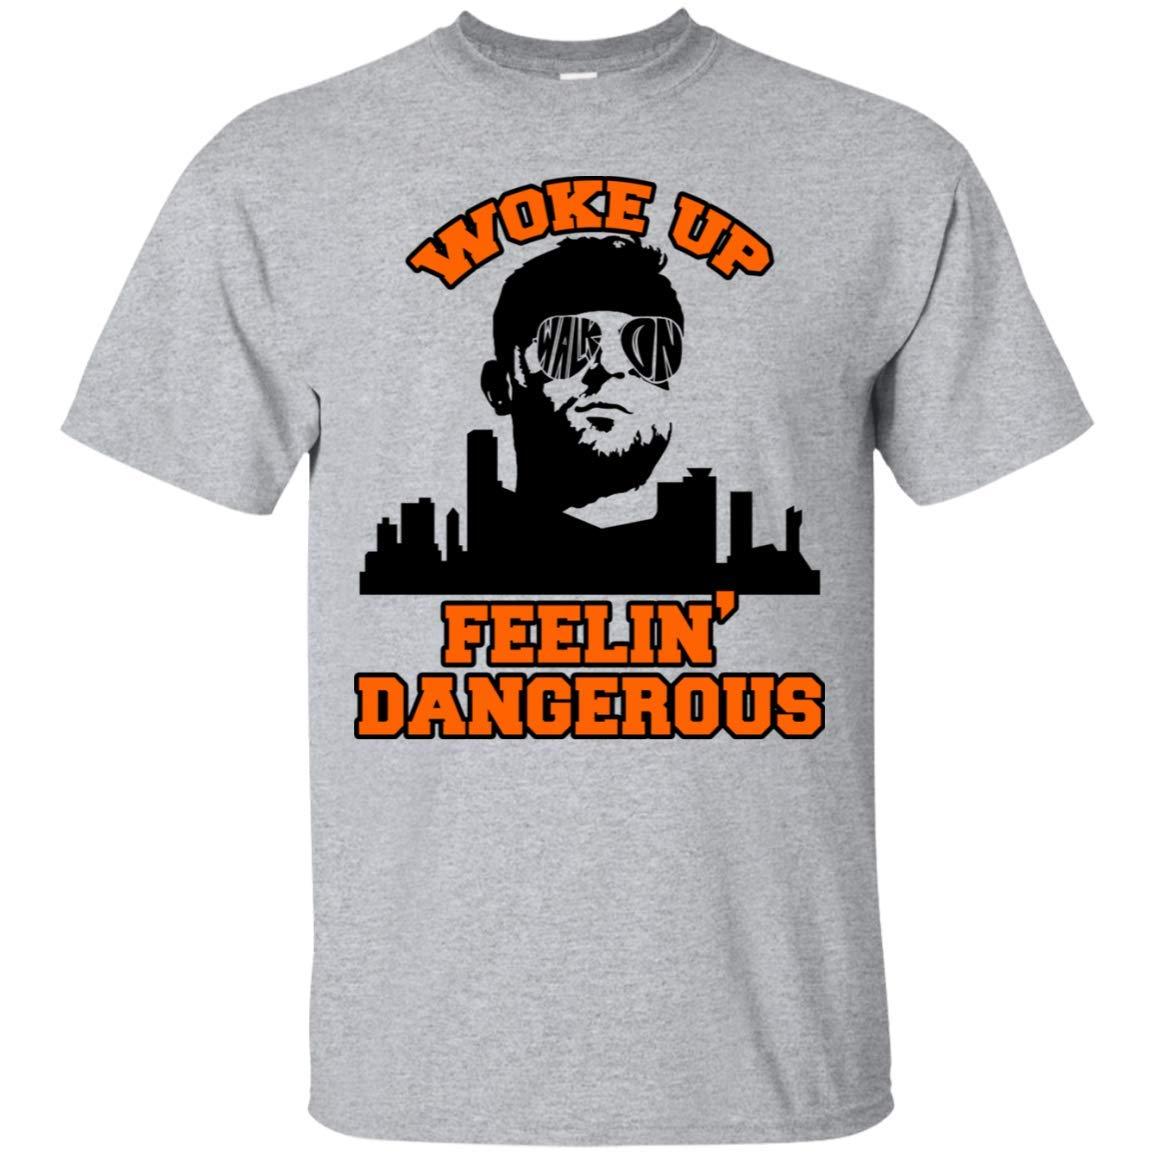 Woke Up Dangerous Cleveland Funny Football Tshirt Brownies Needed A Baker Vneck Shirt